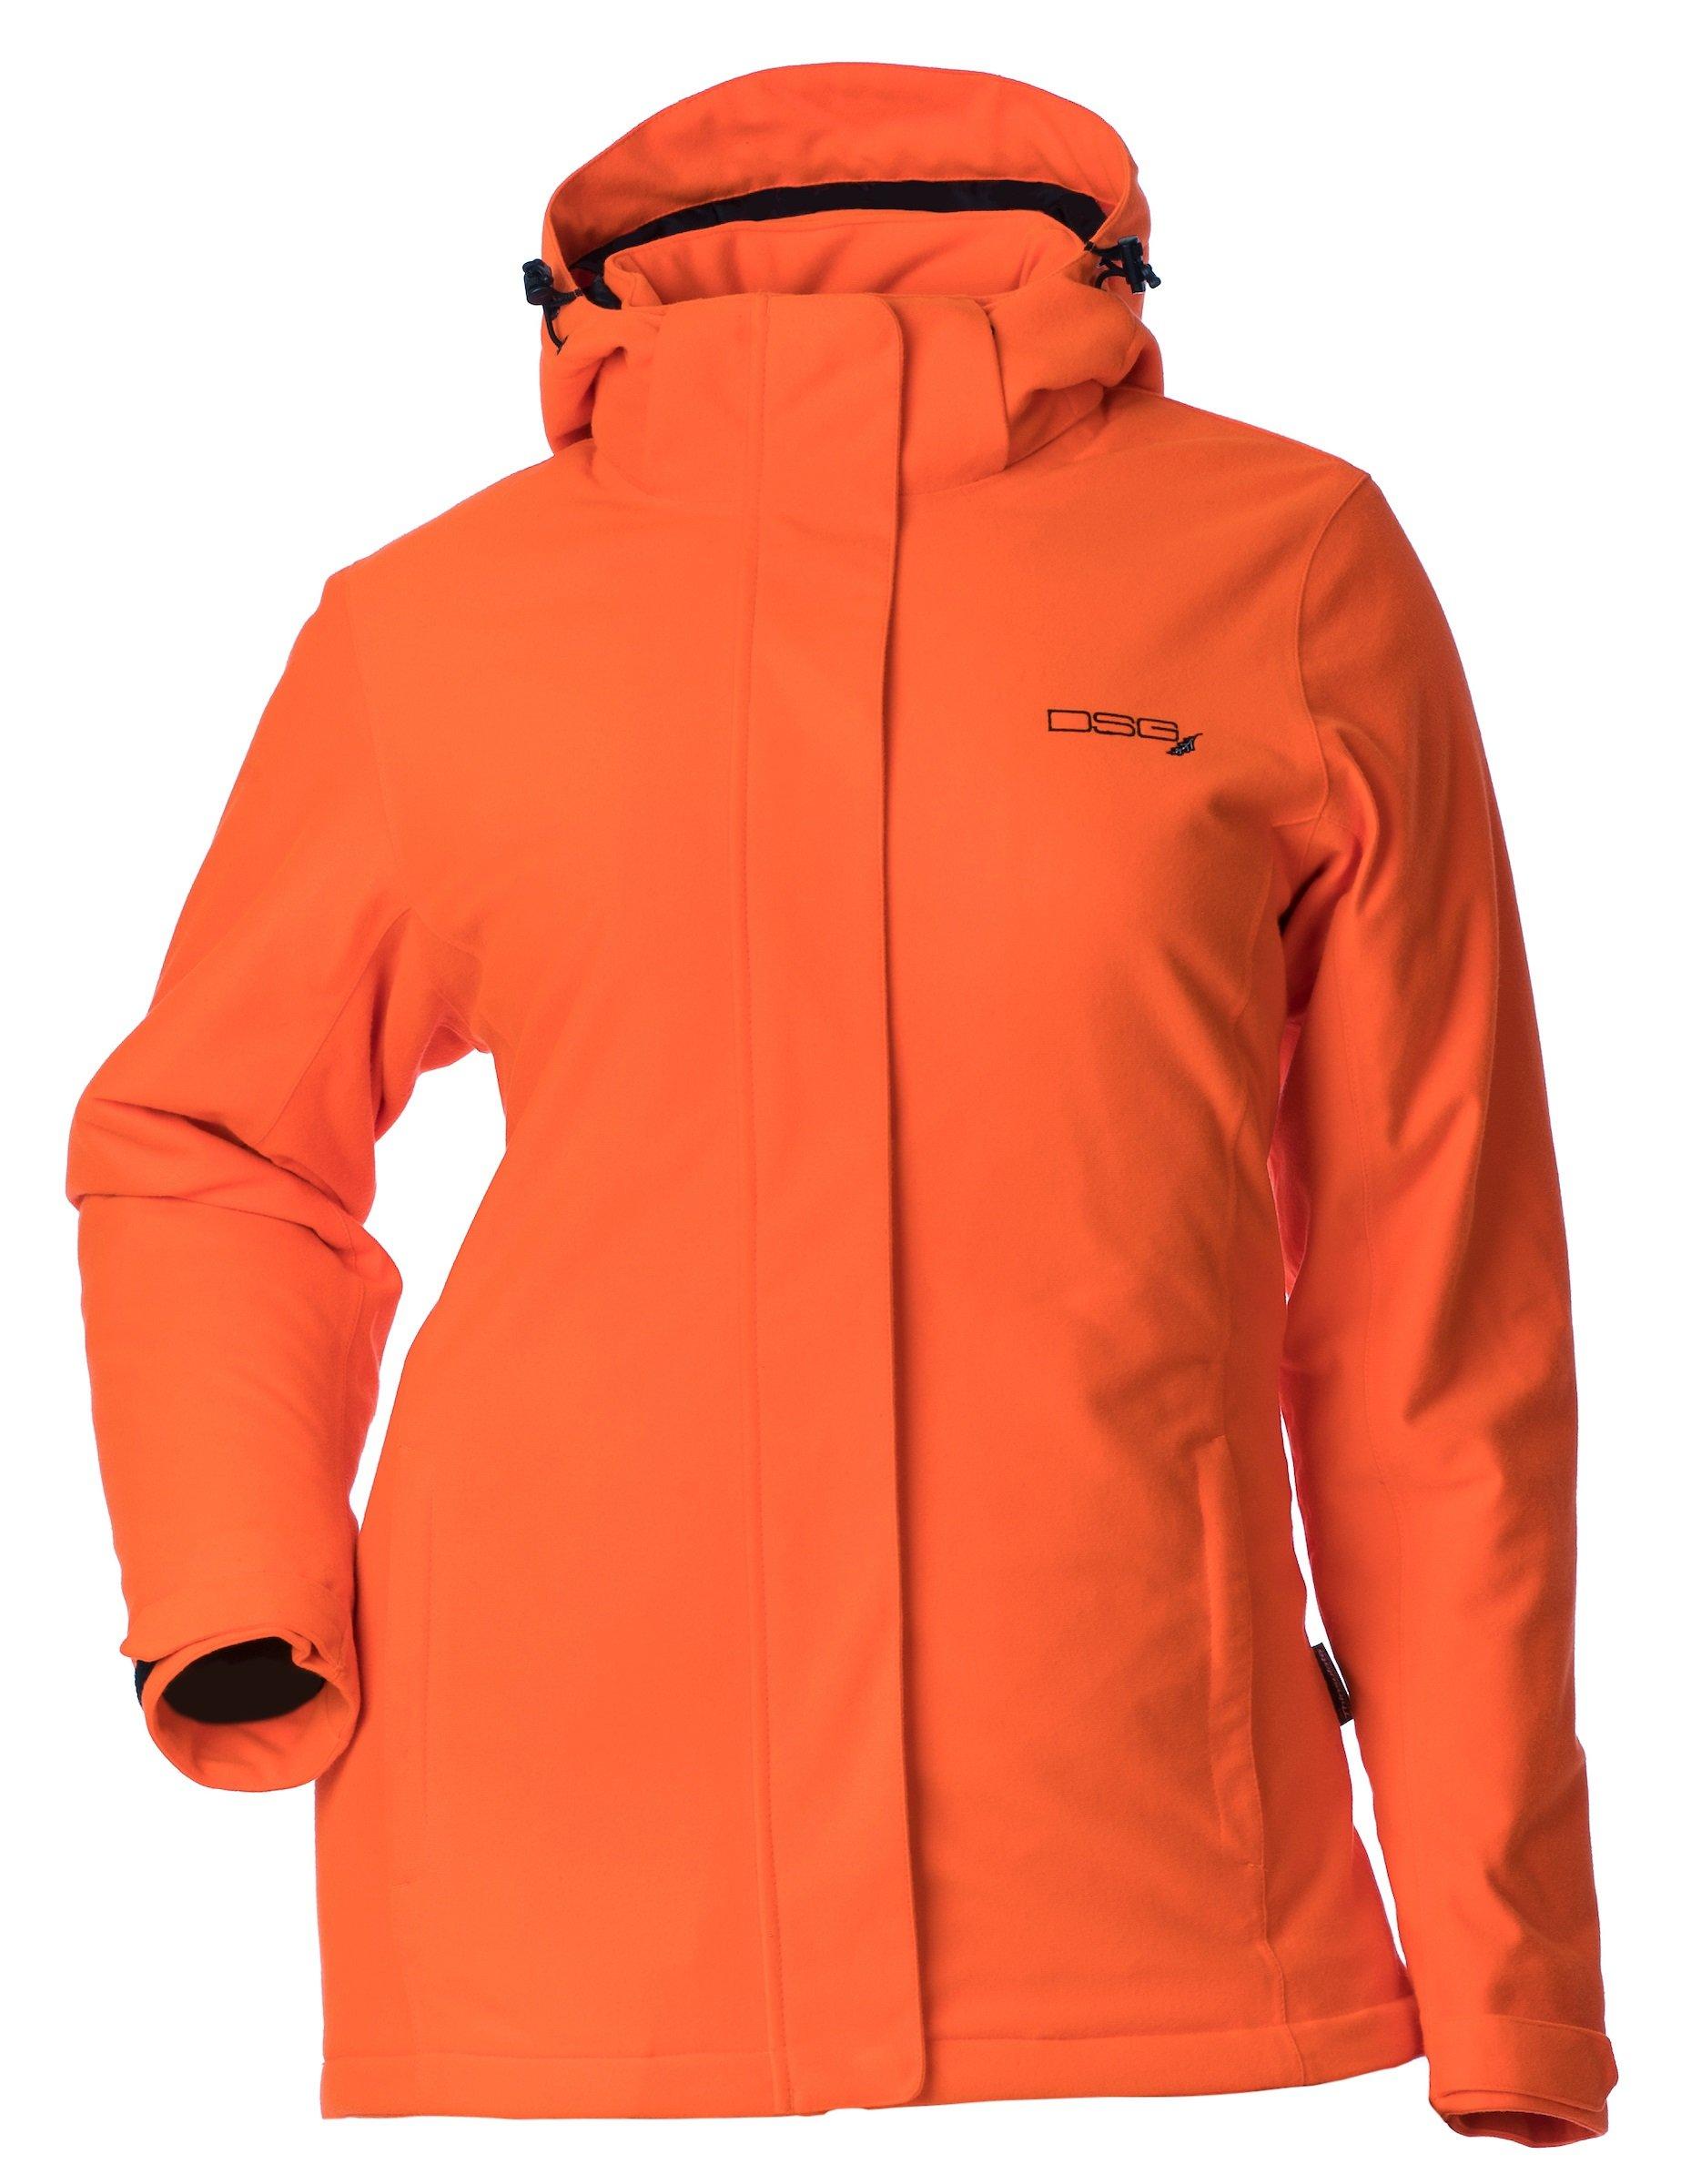 DSG Outerwear Women's Addie Hunting Jacket, Blaze Orange, Large by DSG Outerwear